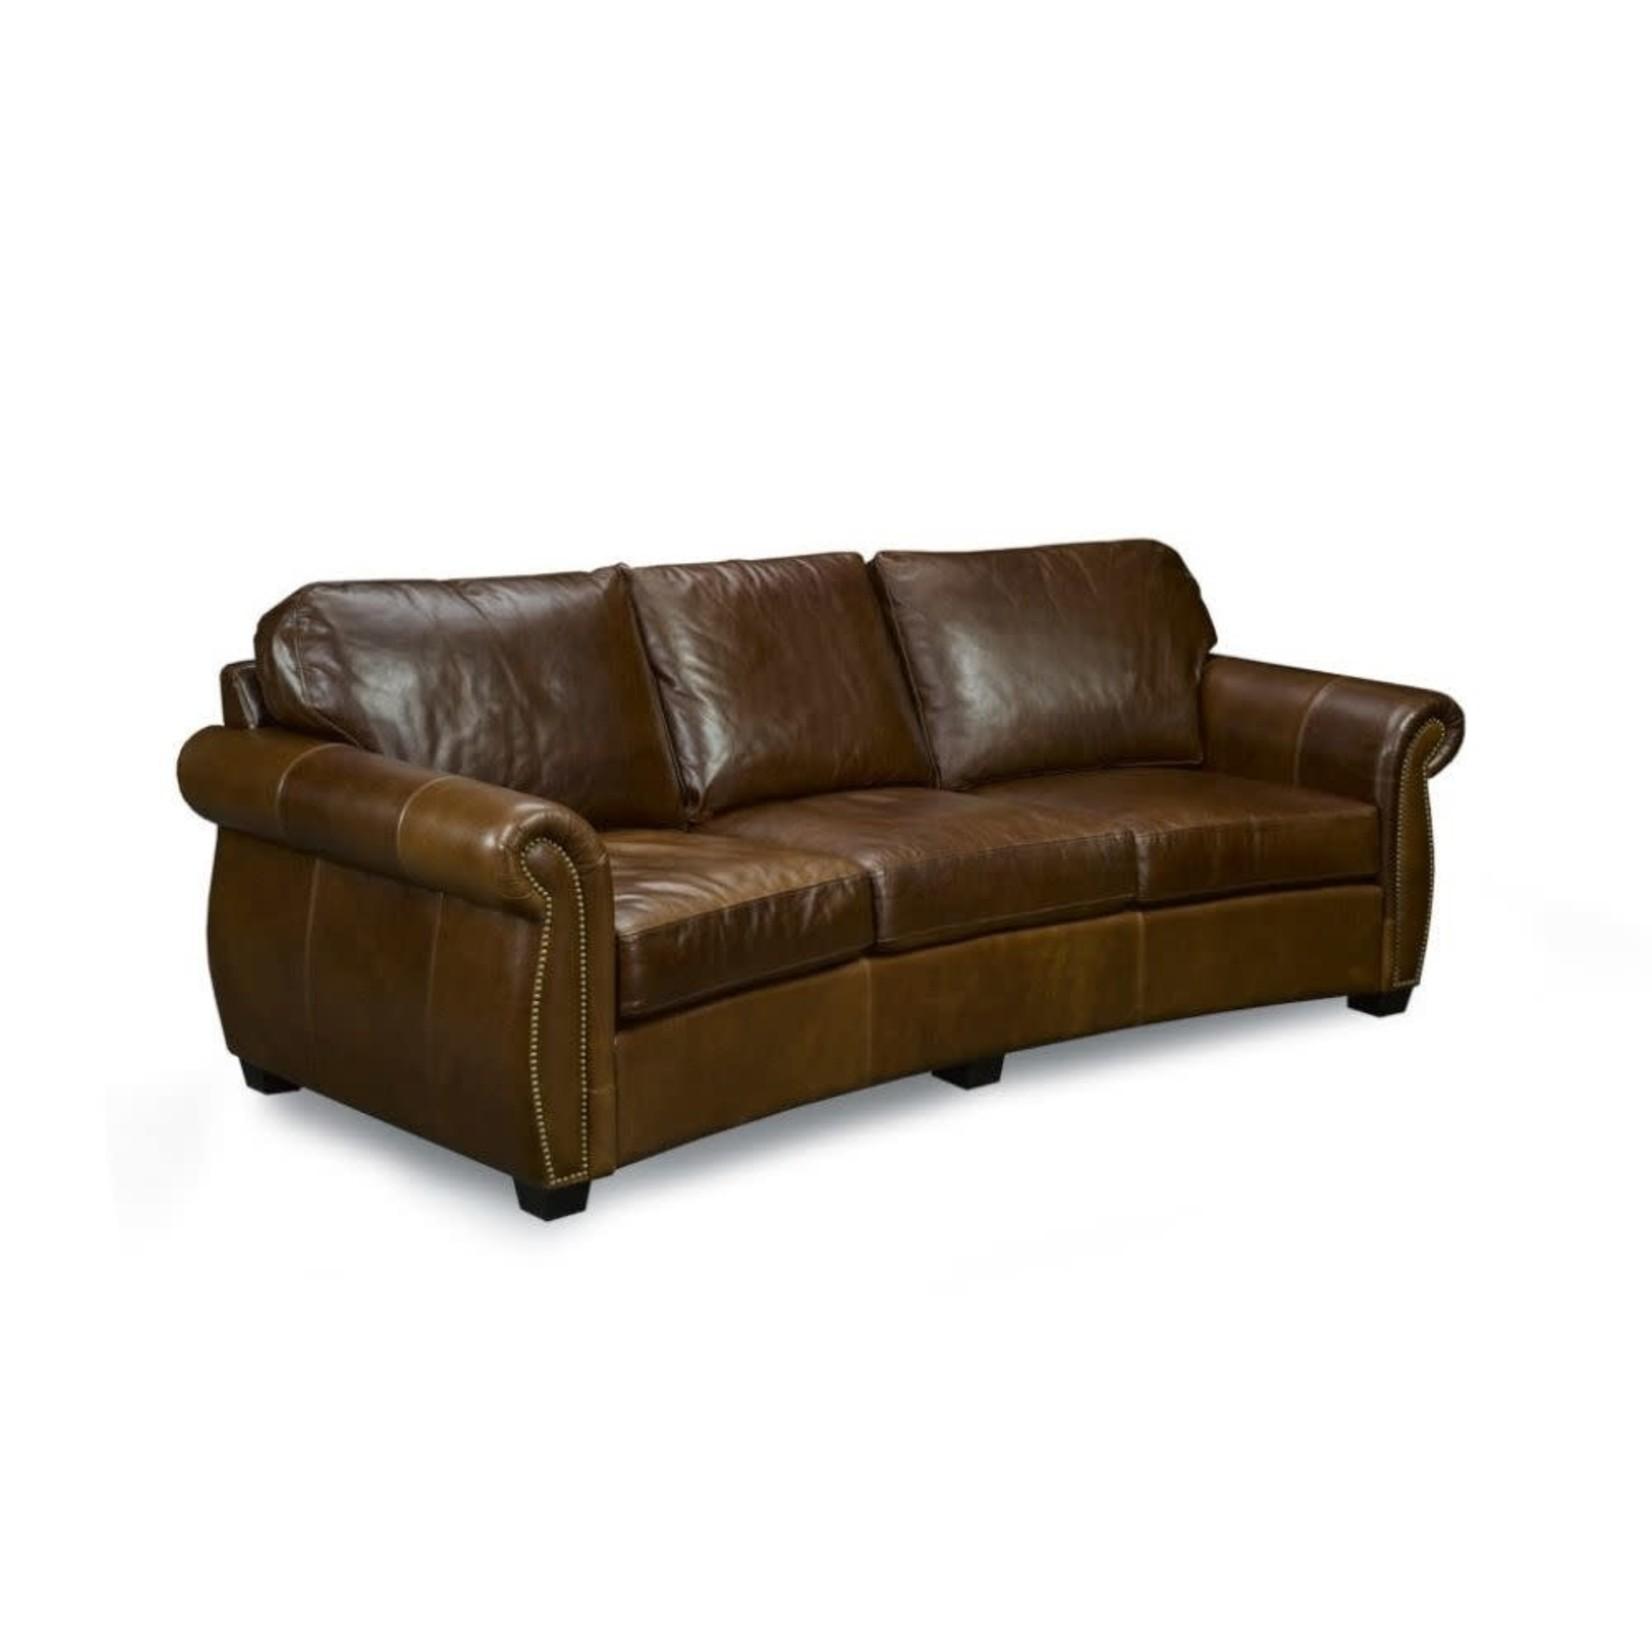 Brentwood Classics Emmett Sofa